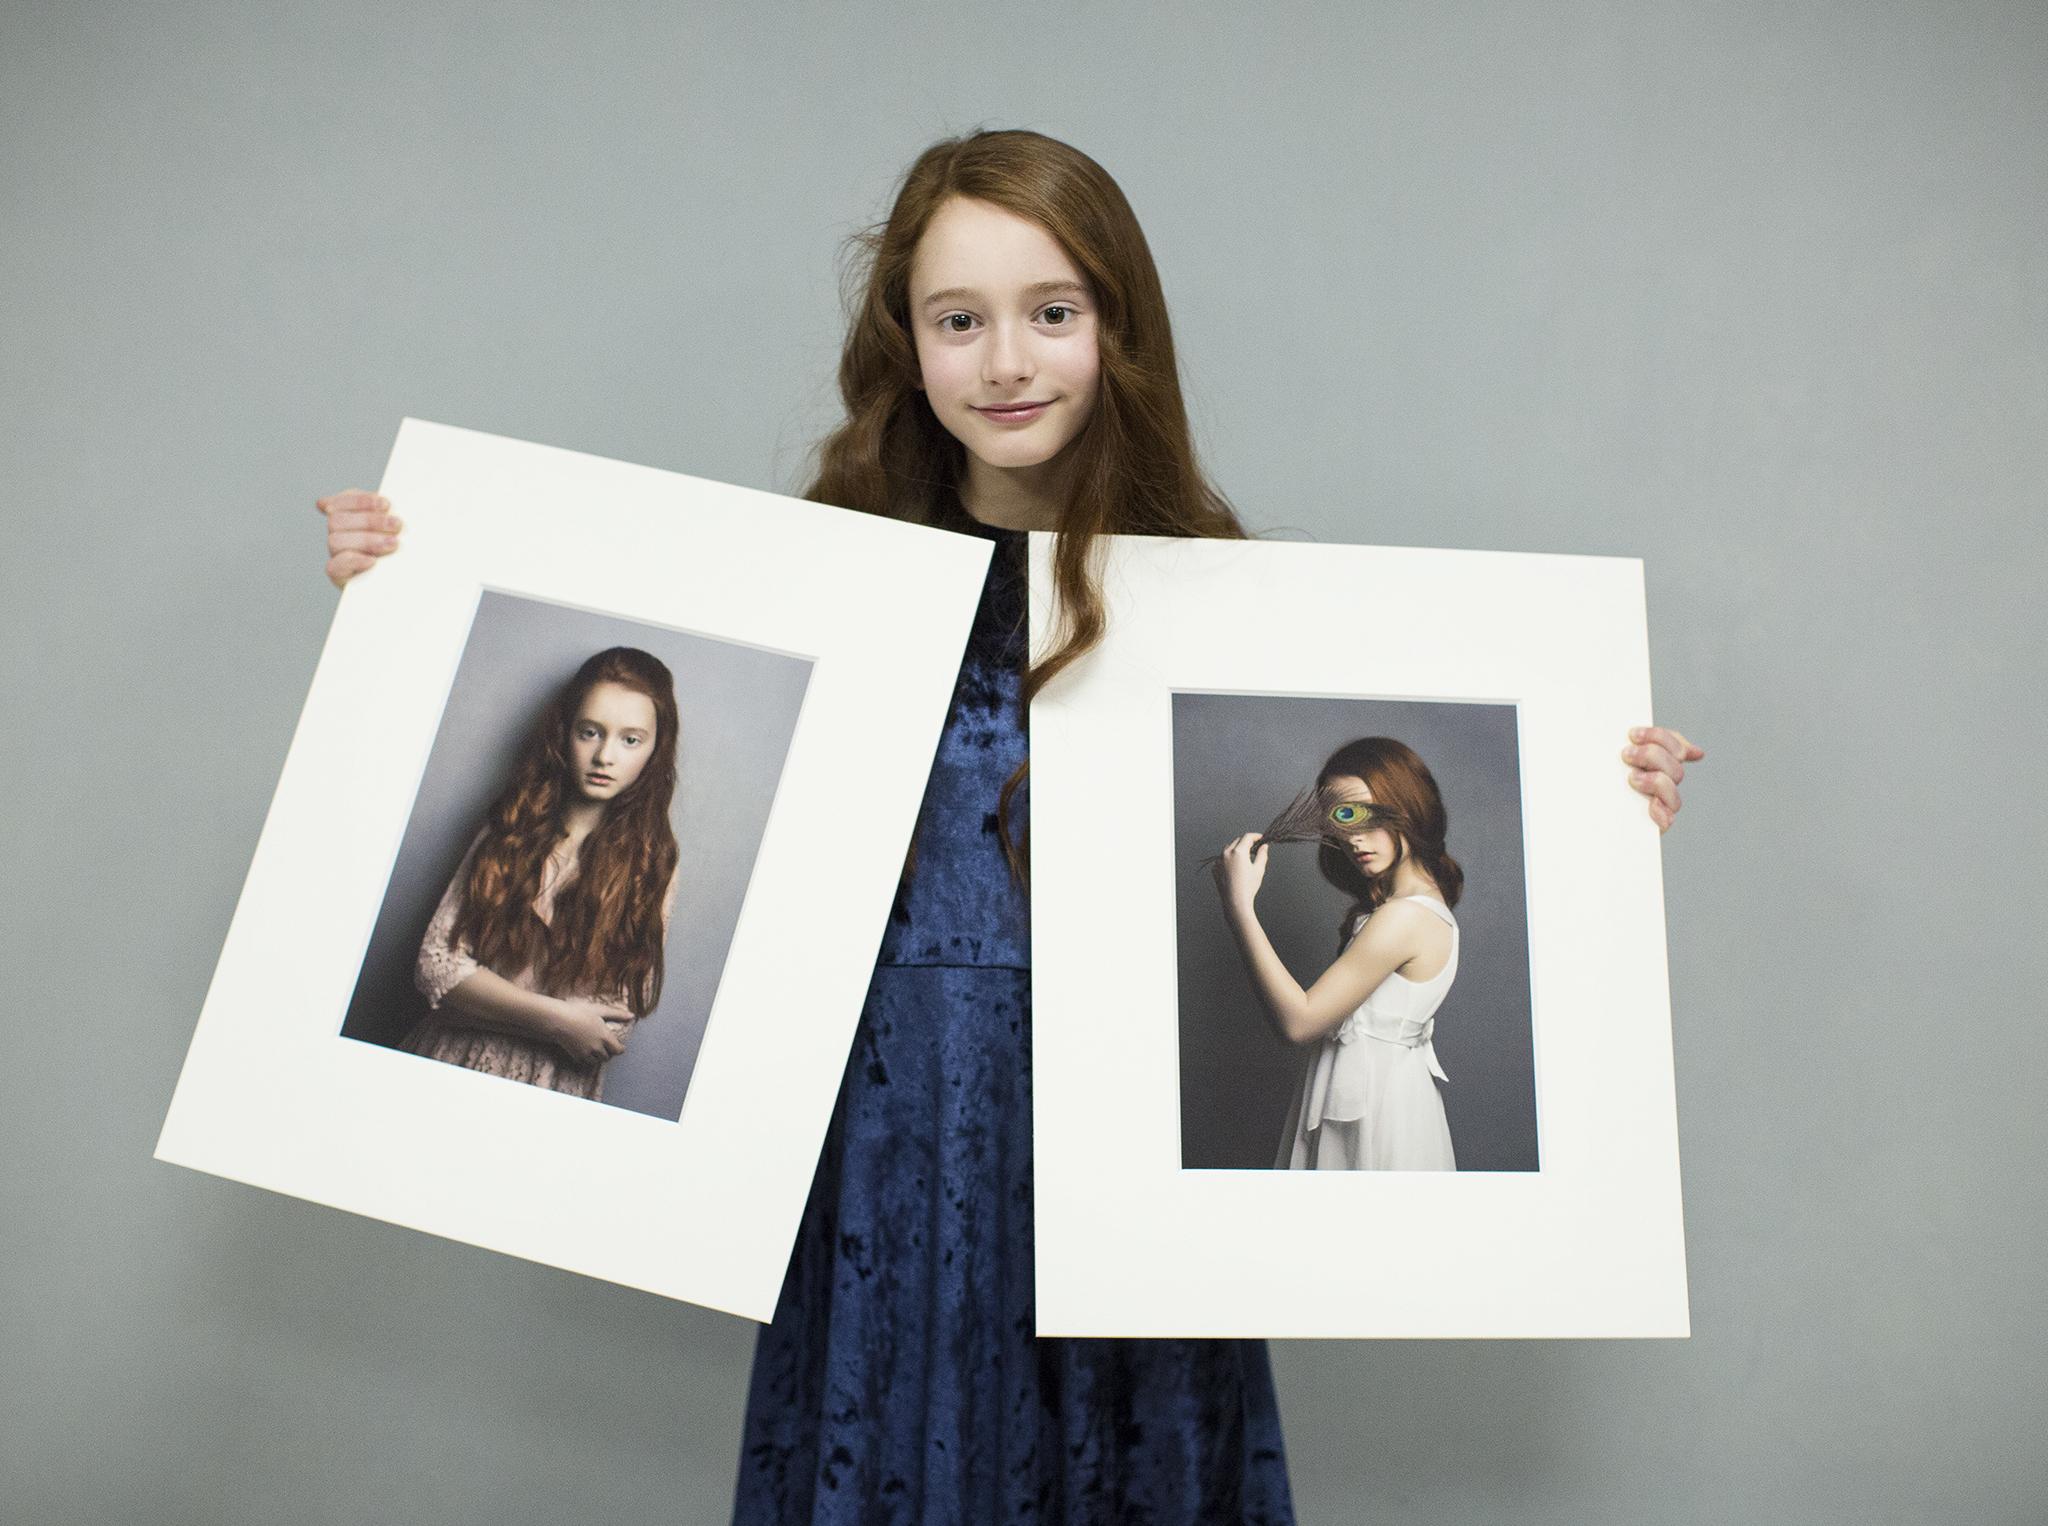 elizabethg_photography_hertfordshire_fineart_child_portrait_model_sadie_byron_bruceandbrown3.jpg